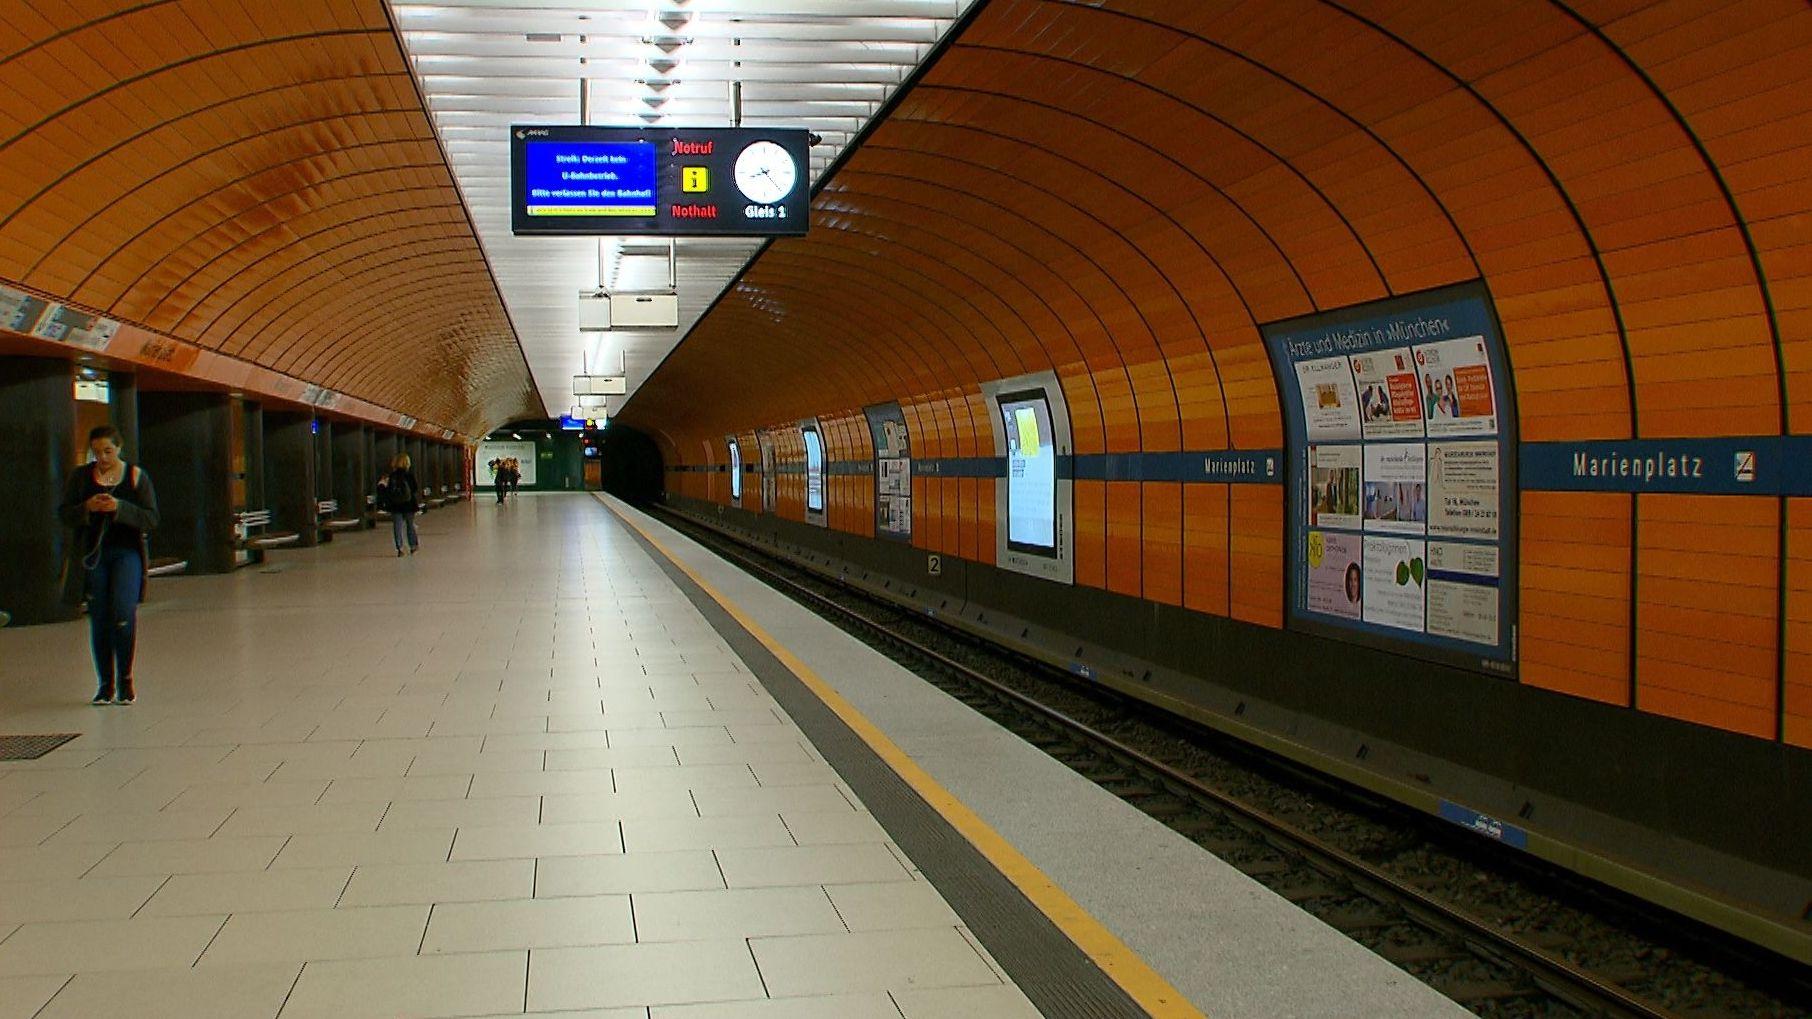 Leerer U-Bahnsteig am Marienplatz